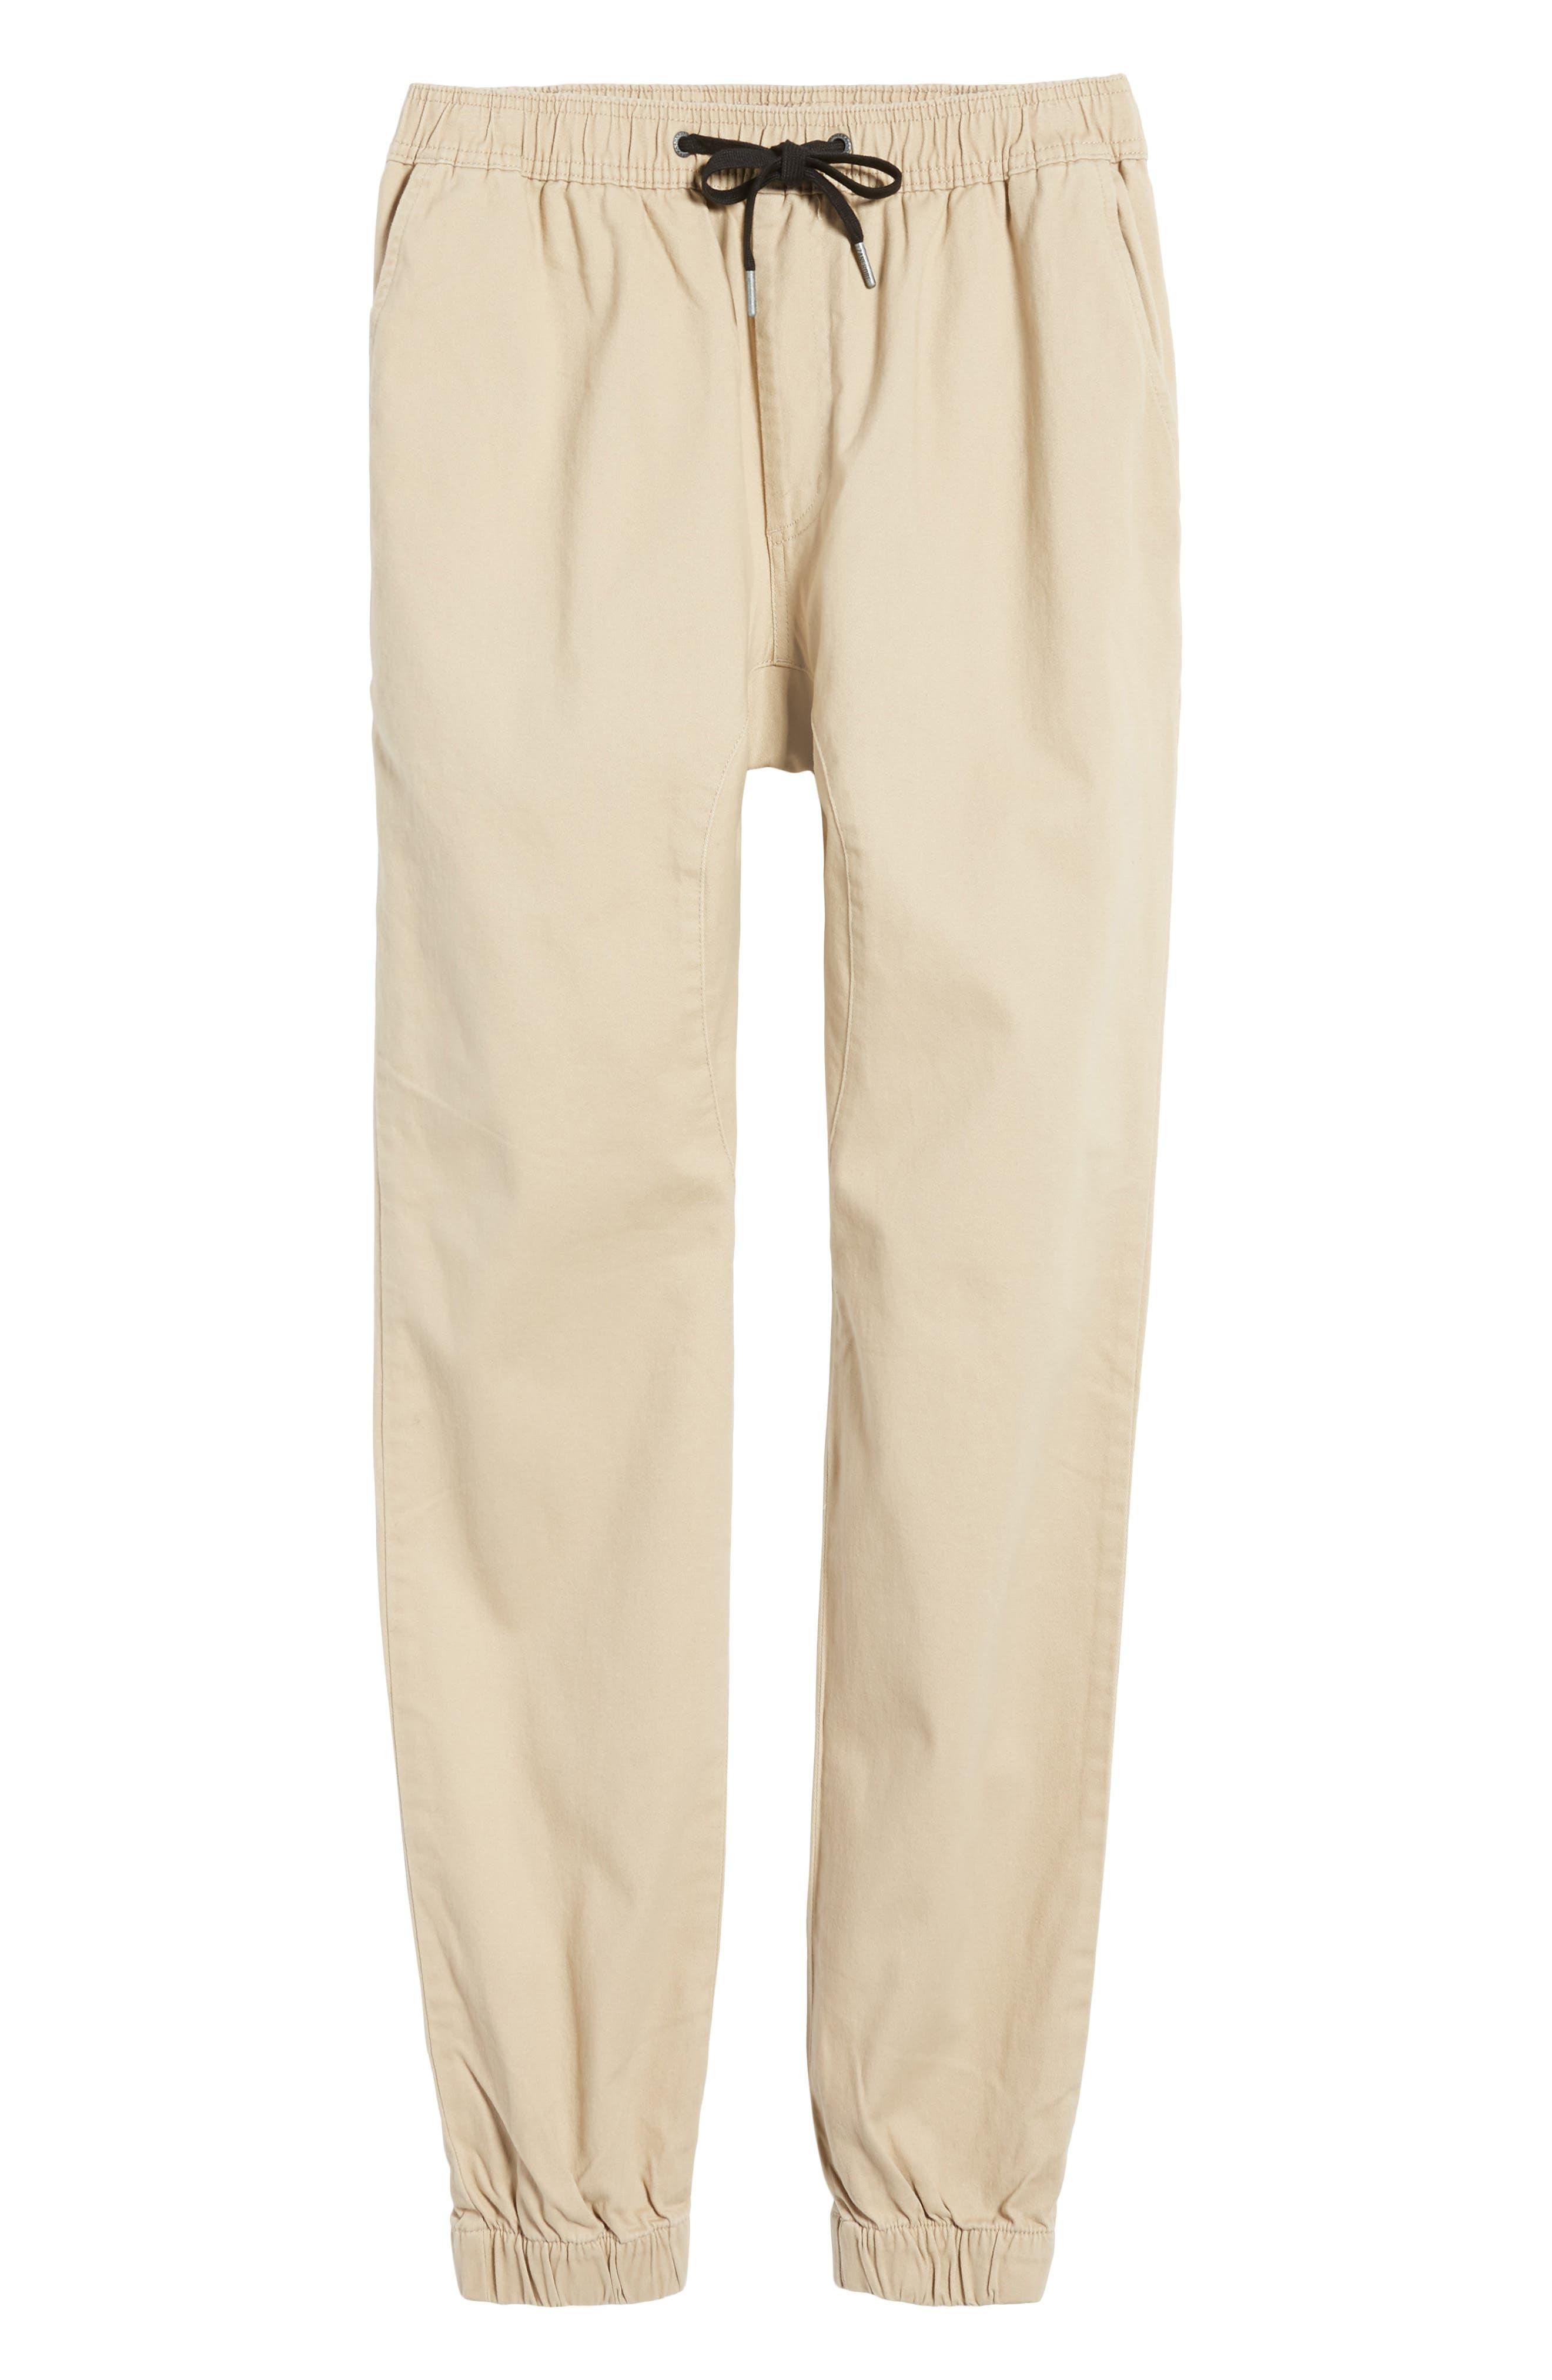 'Sureshot' Jogger Pants, Main, color, 281